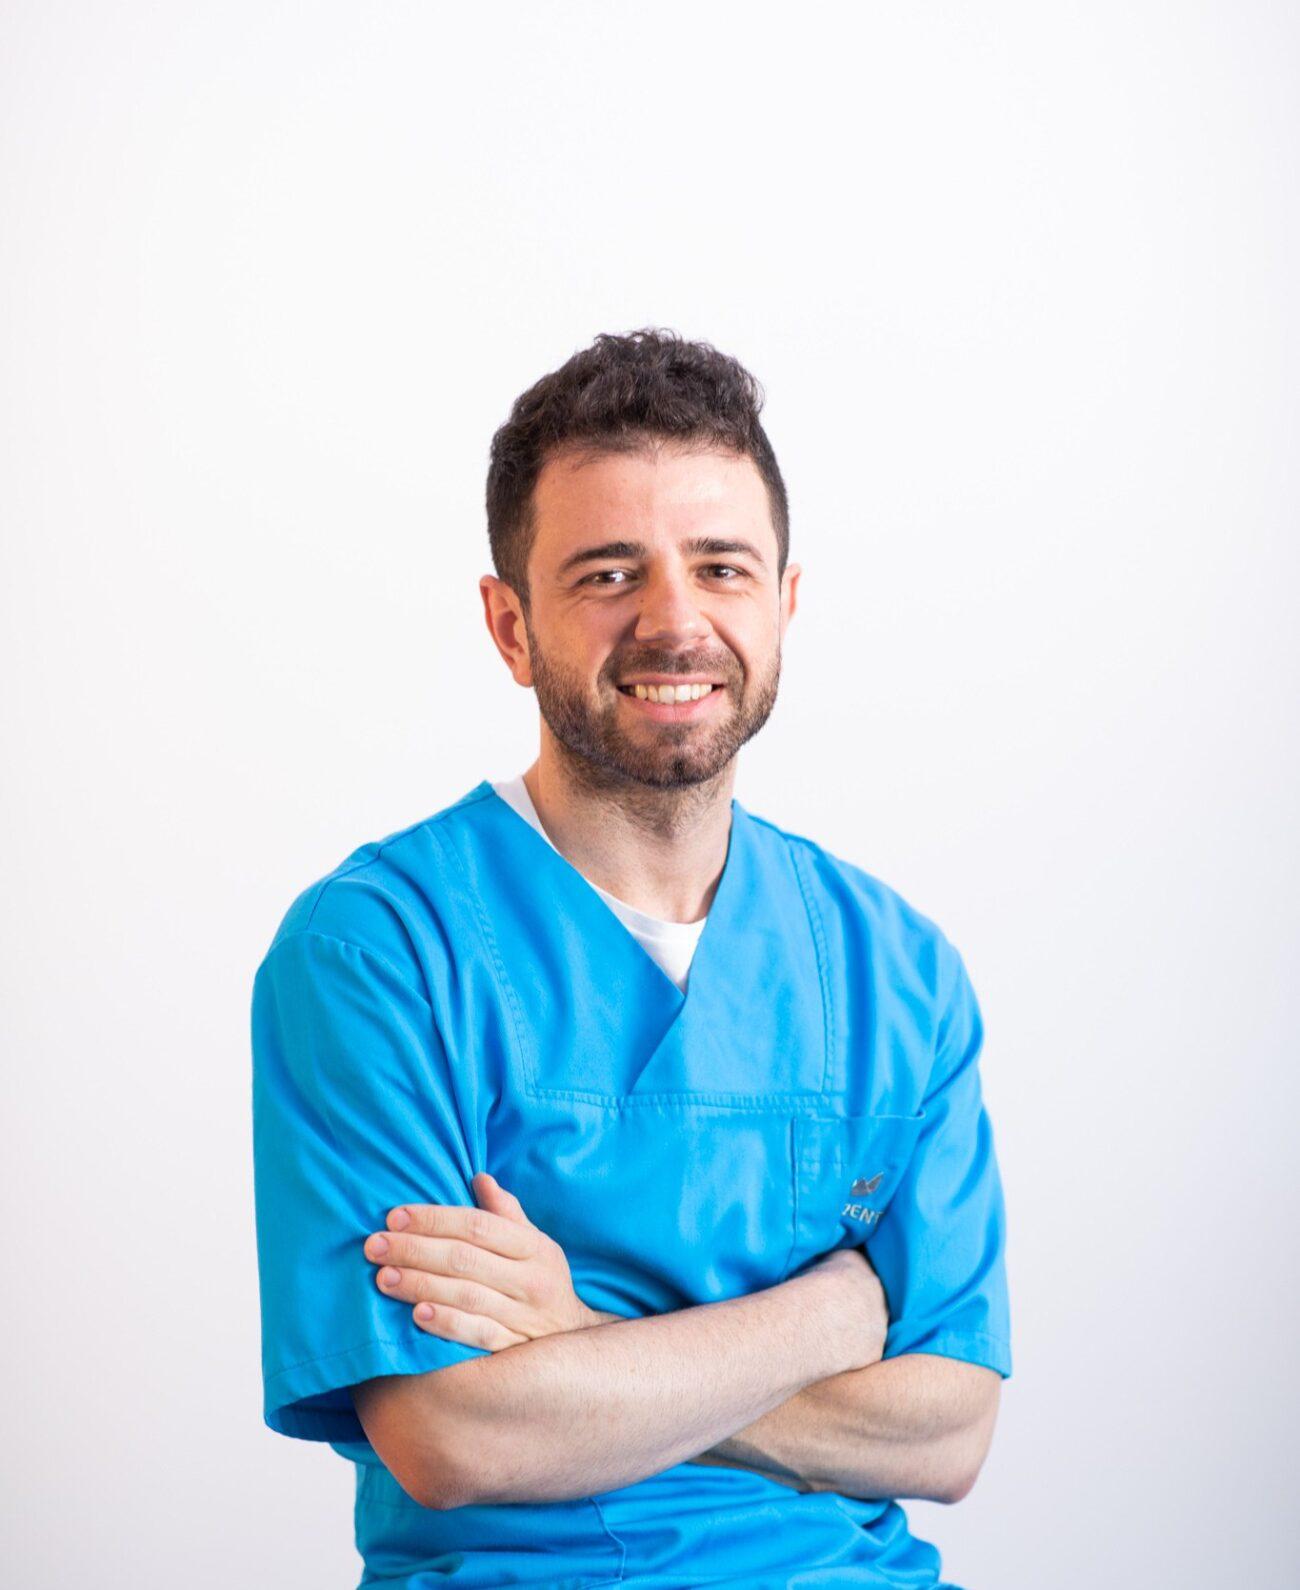 Dr-alexandru-isop-trident